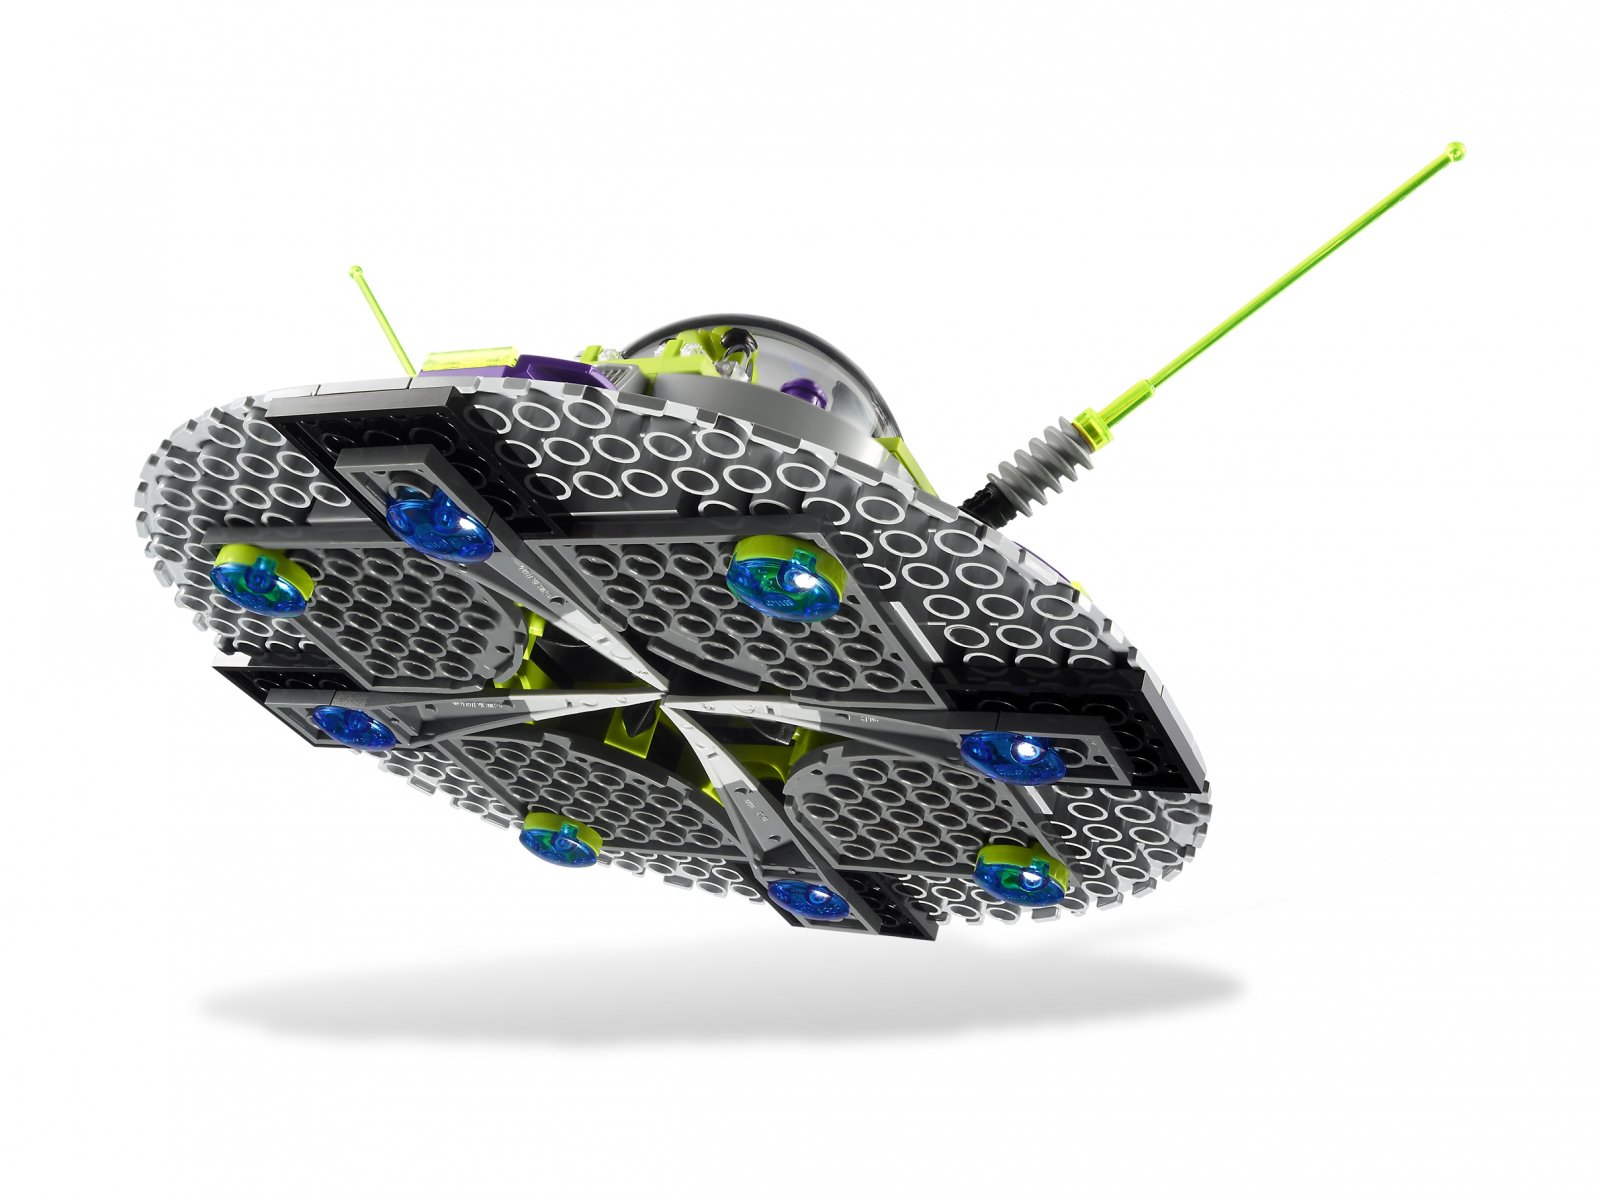 LEGO 7052 Alien Conquest UFO Abduction